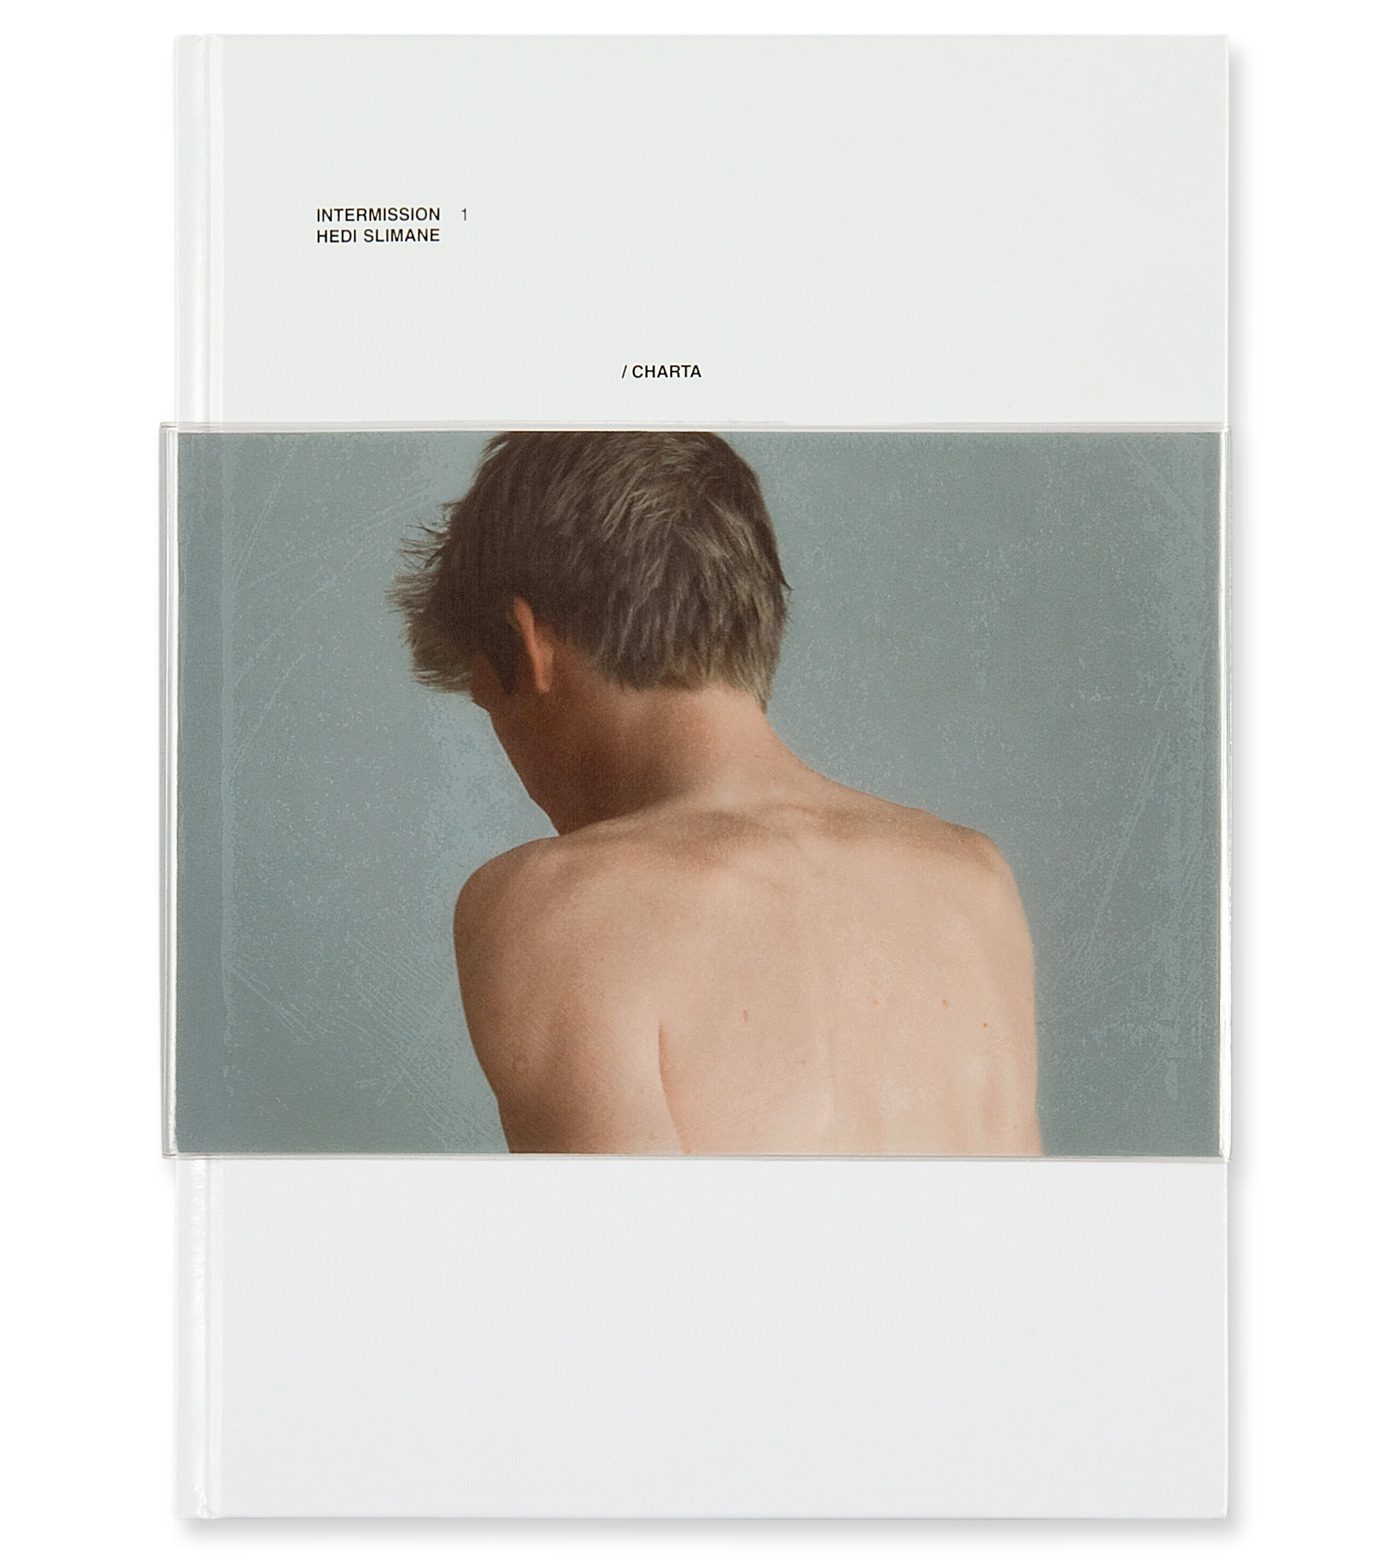 ArtBook(アートブック)のHedi slimane: intermission, 1.-WHITE-8158-374-4-4 拡大詳細画像1